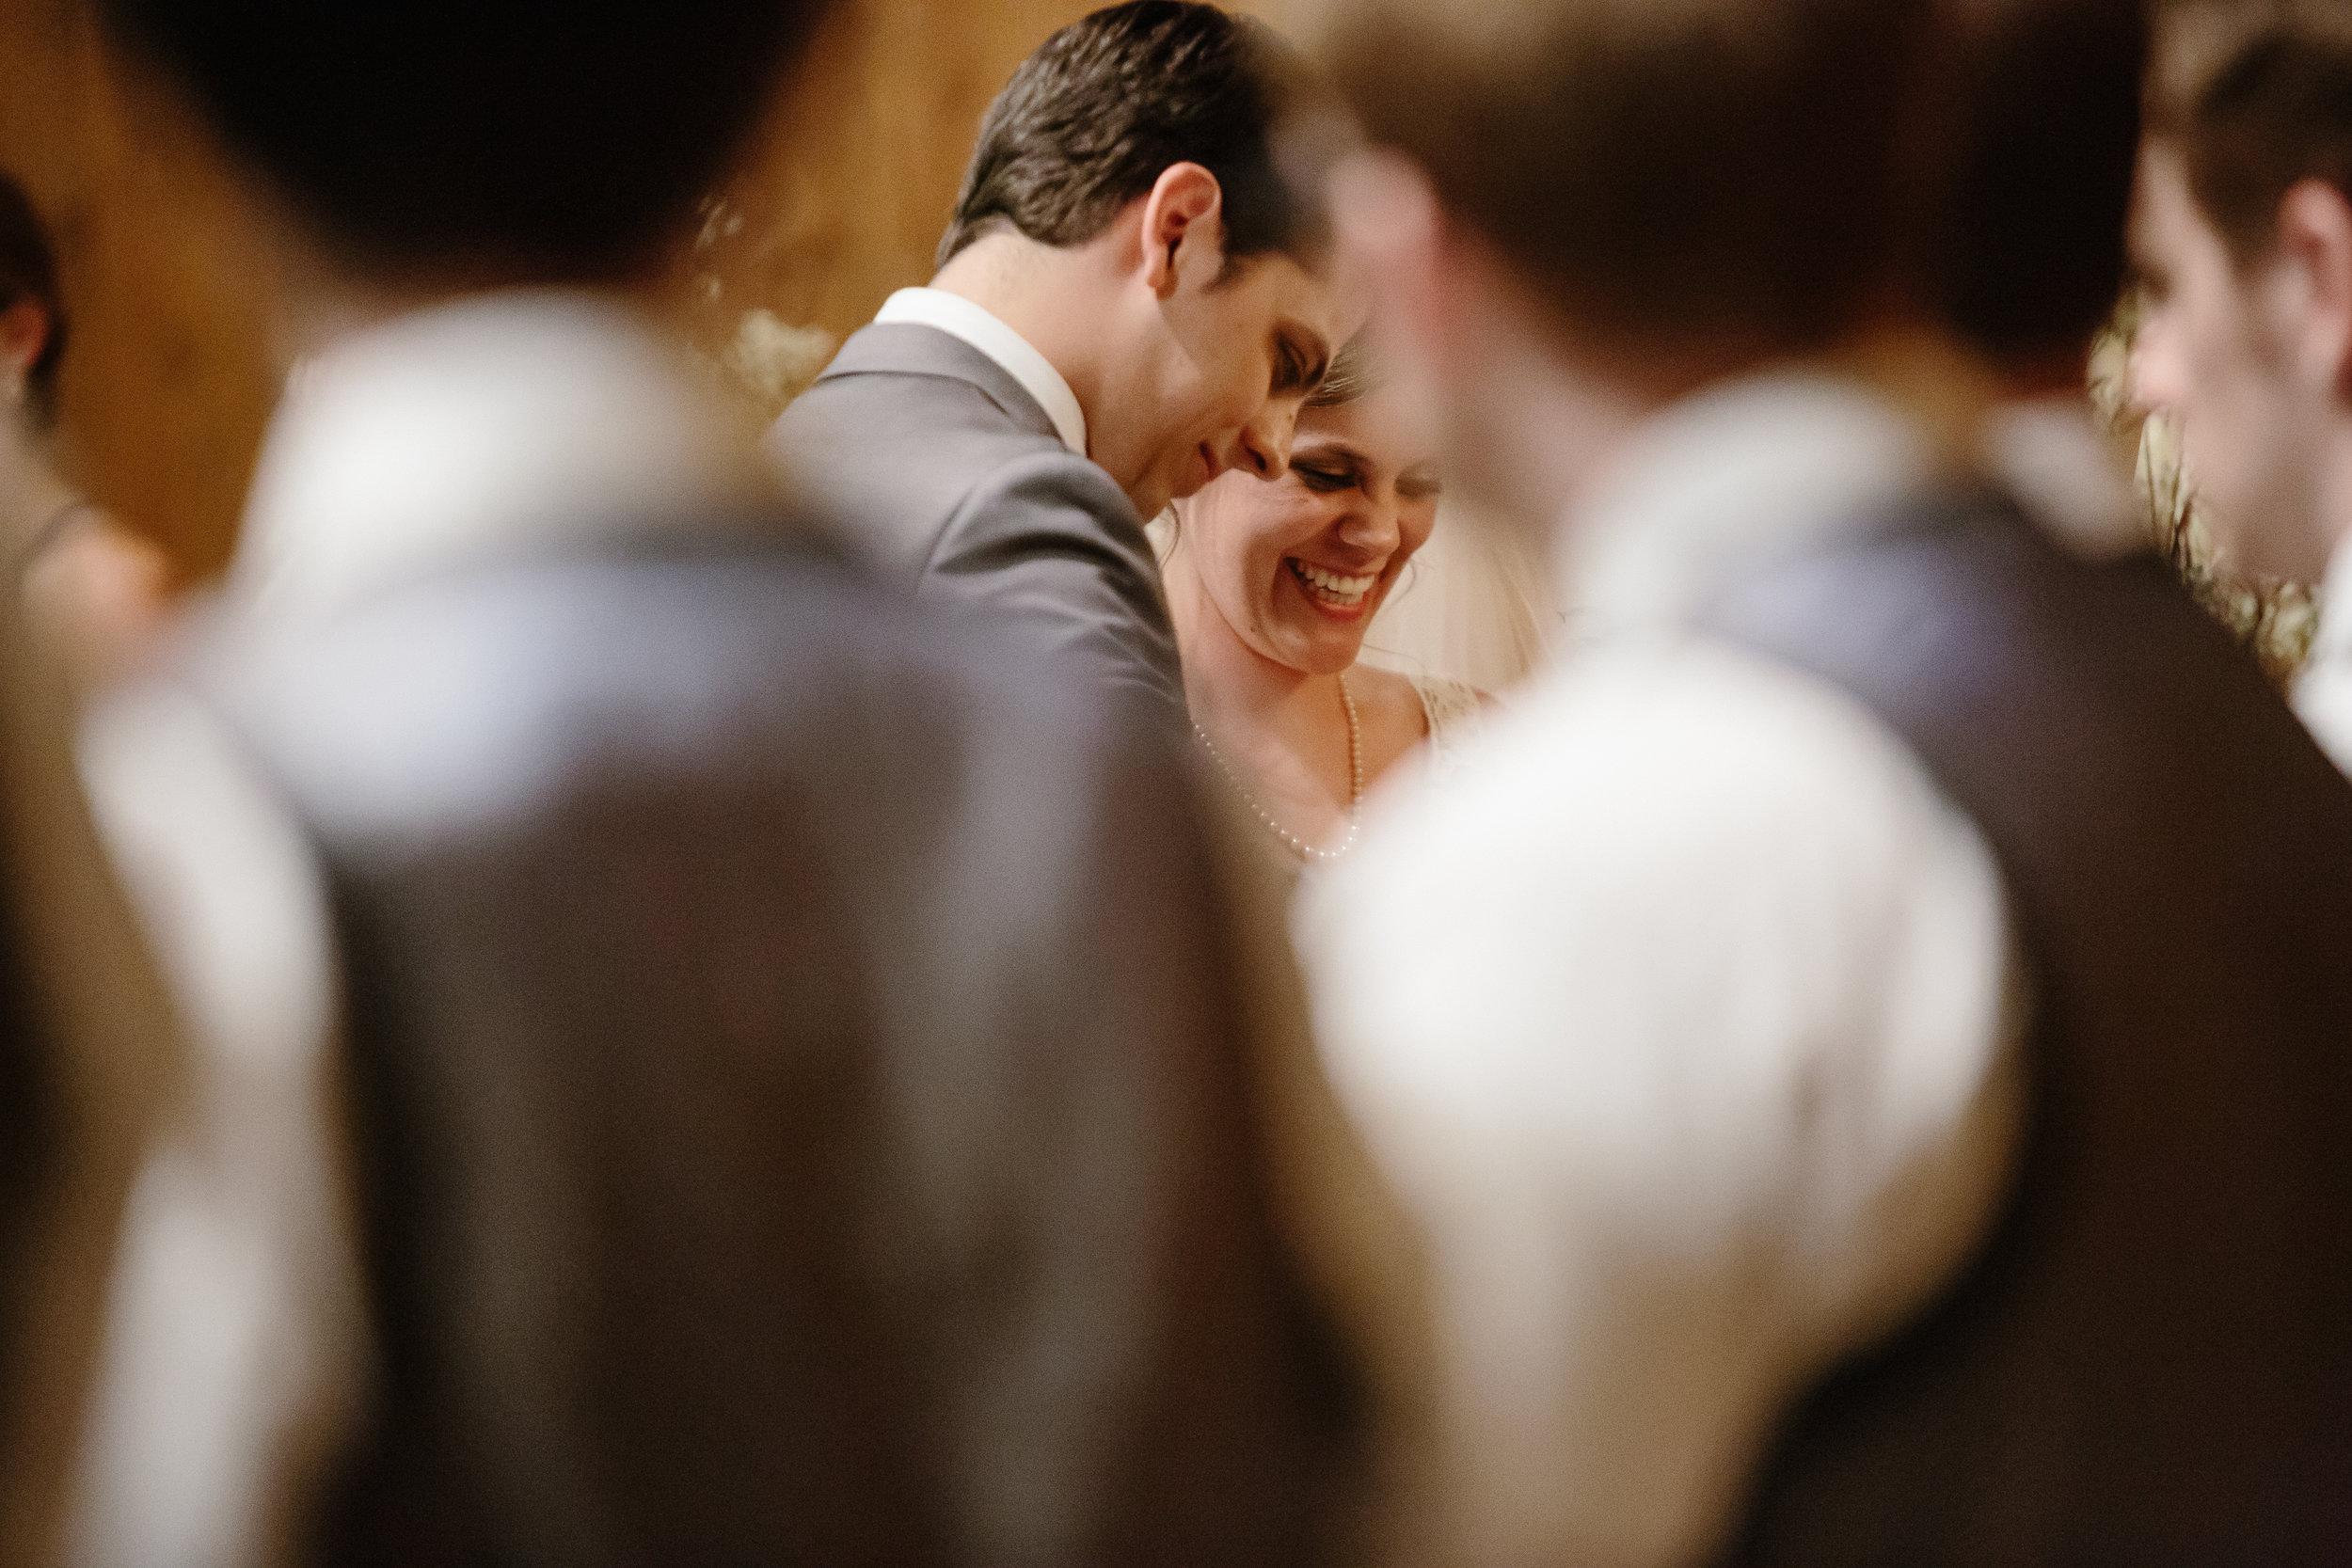 Jordan & Shantel Married - Idaho - Corrie Mick Photography-233.jpg